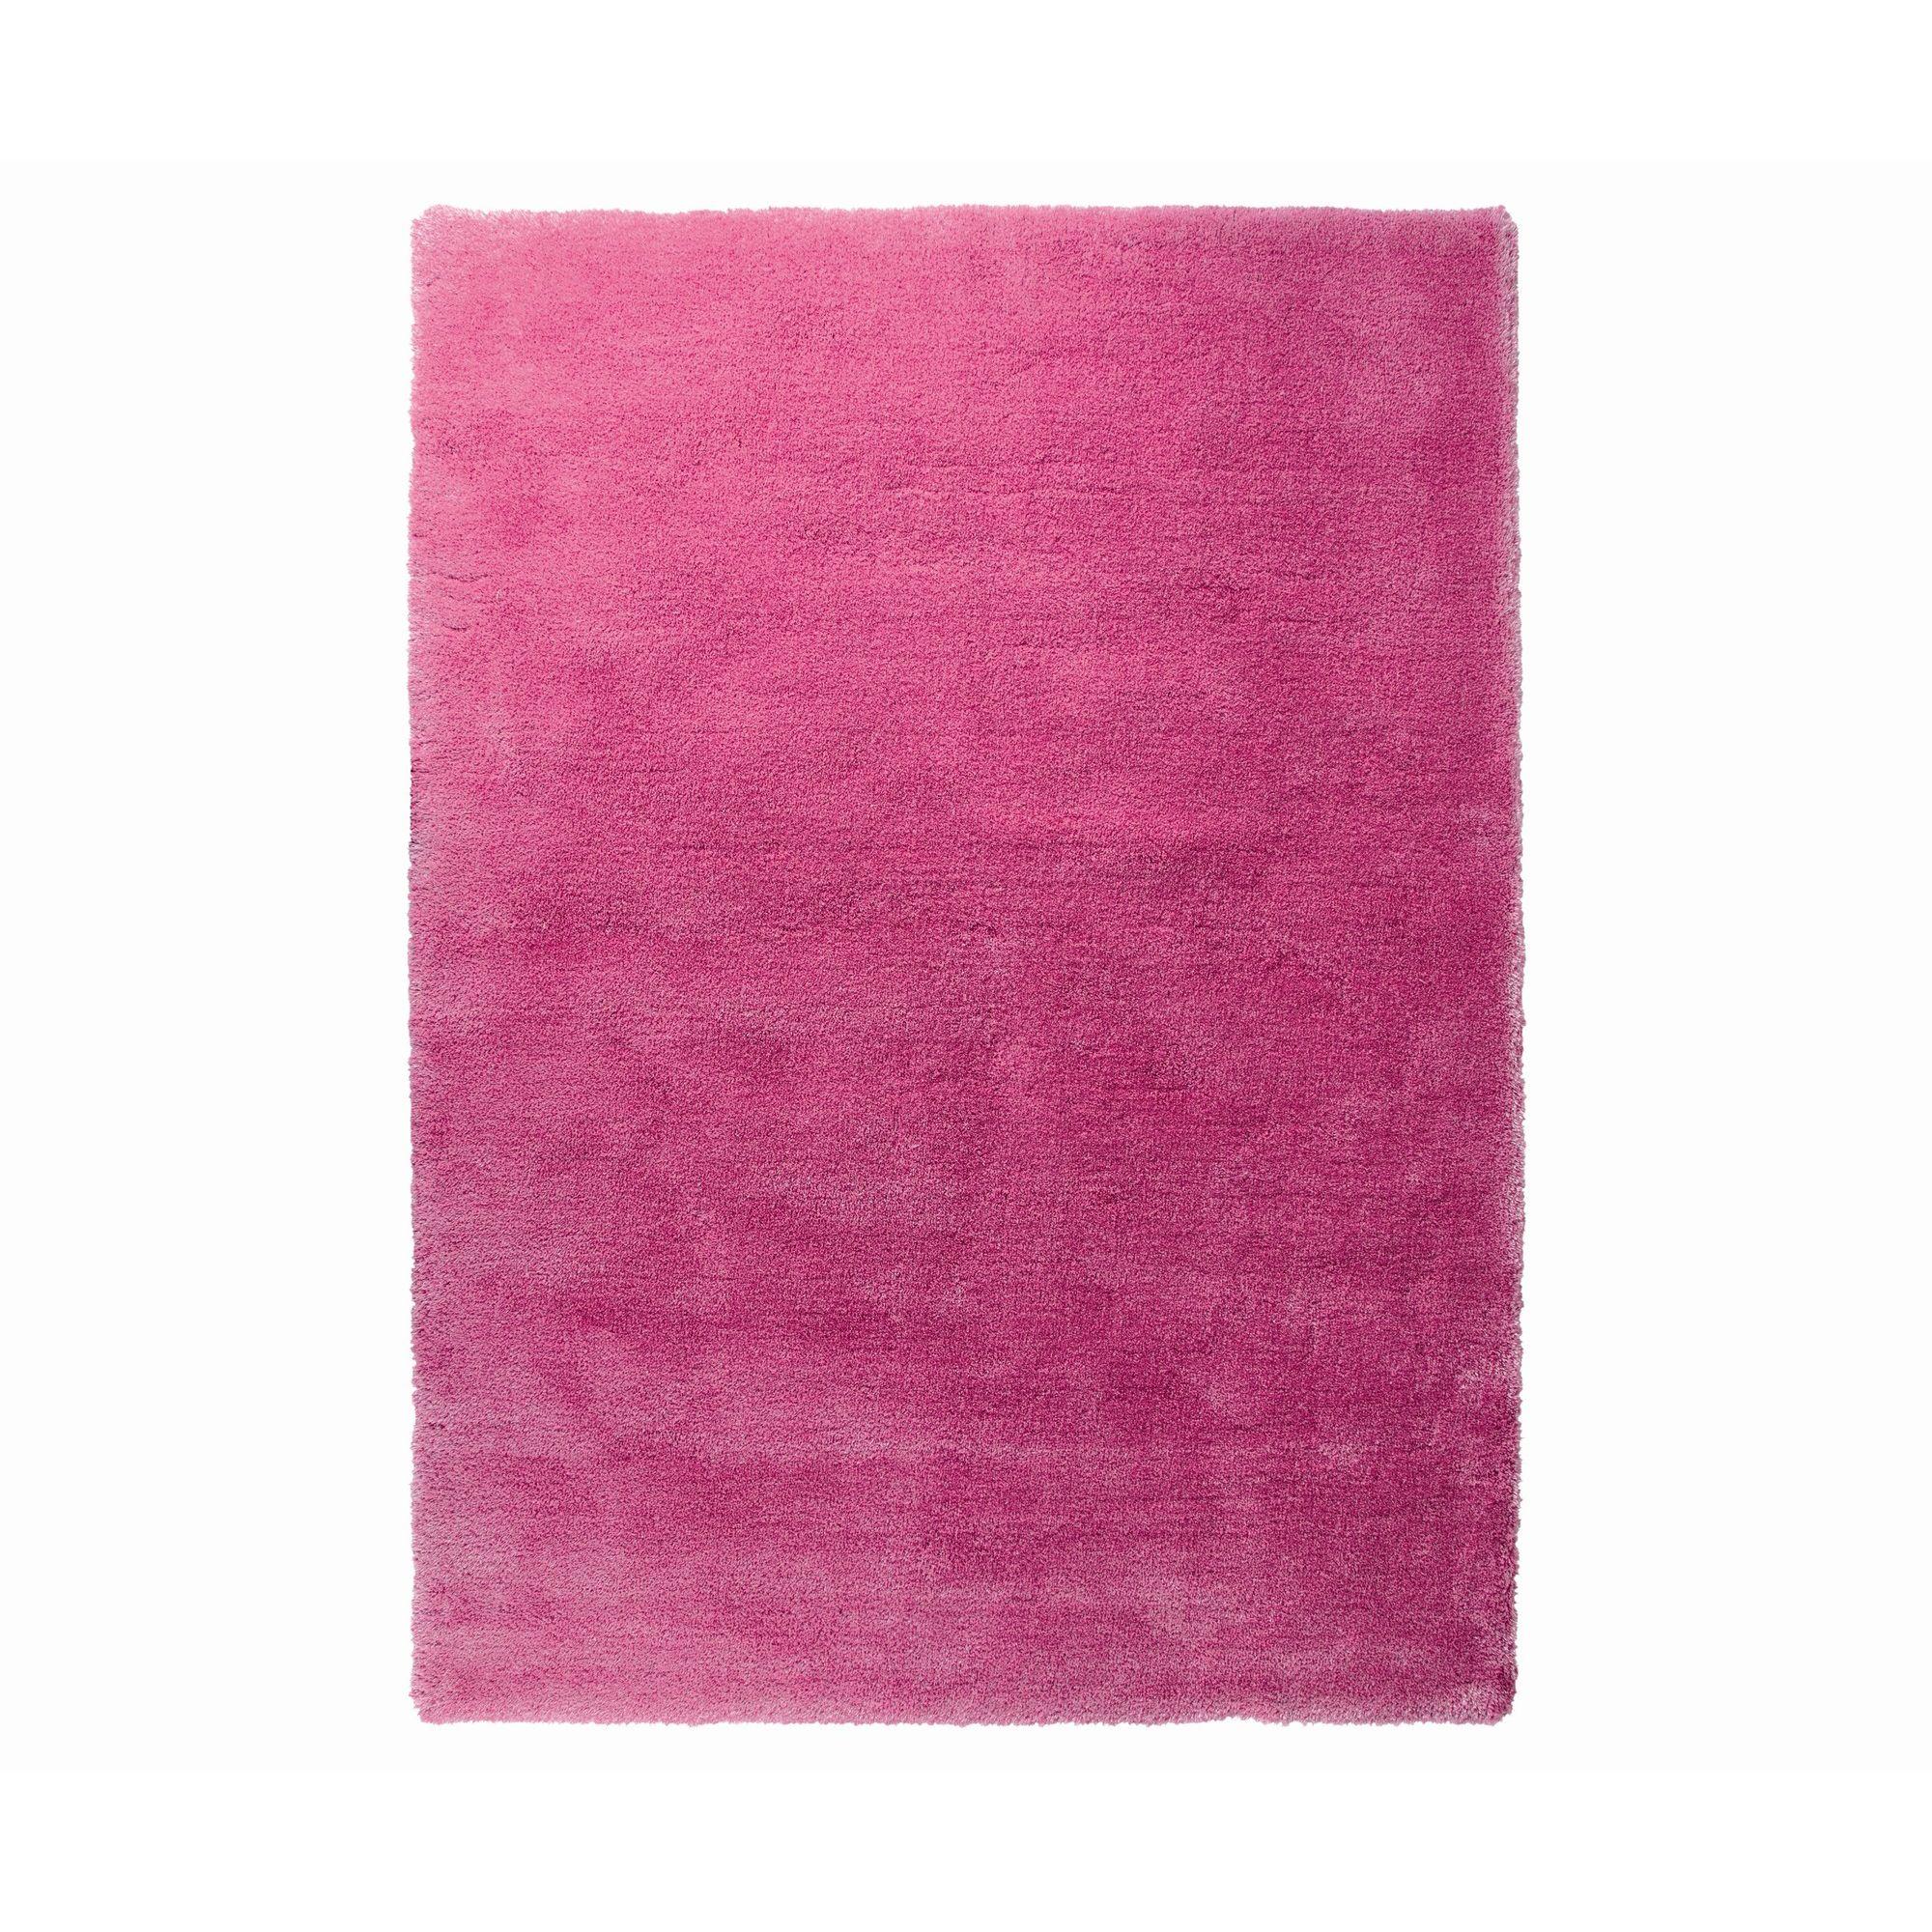 Esprit Soft Glamour Pink Shag Rug 170cm X 240cm